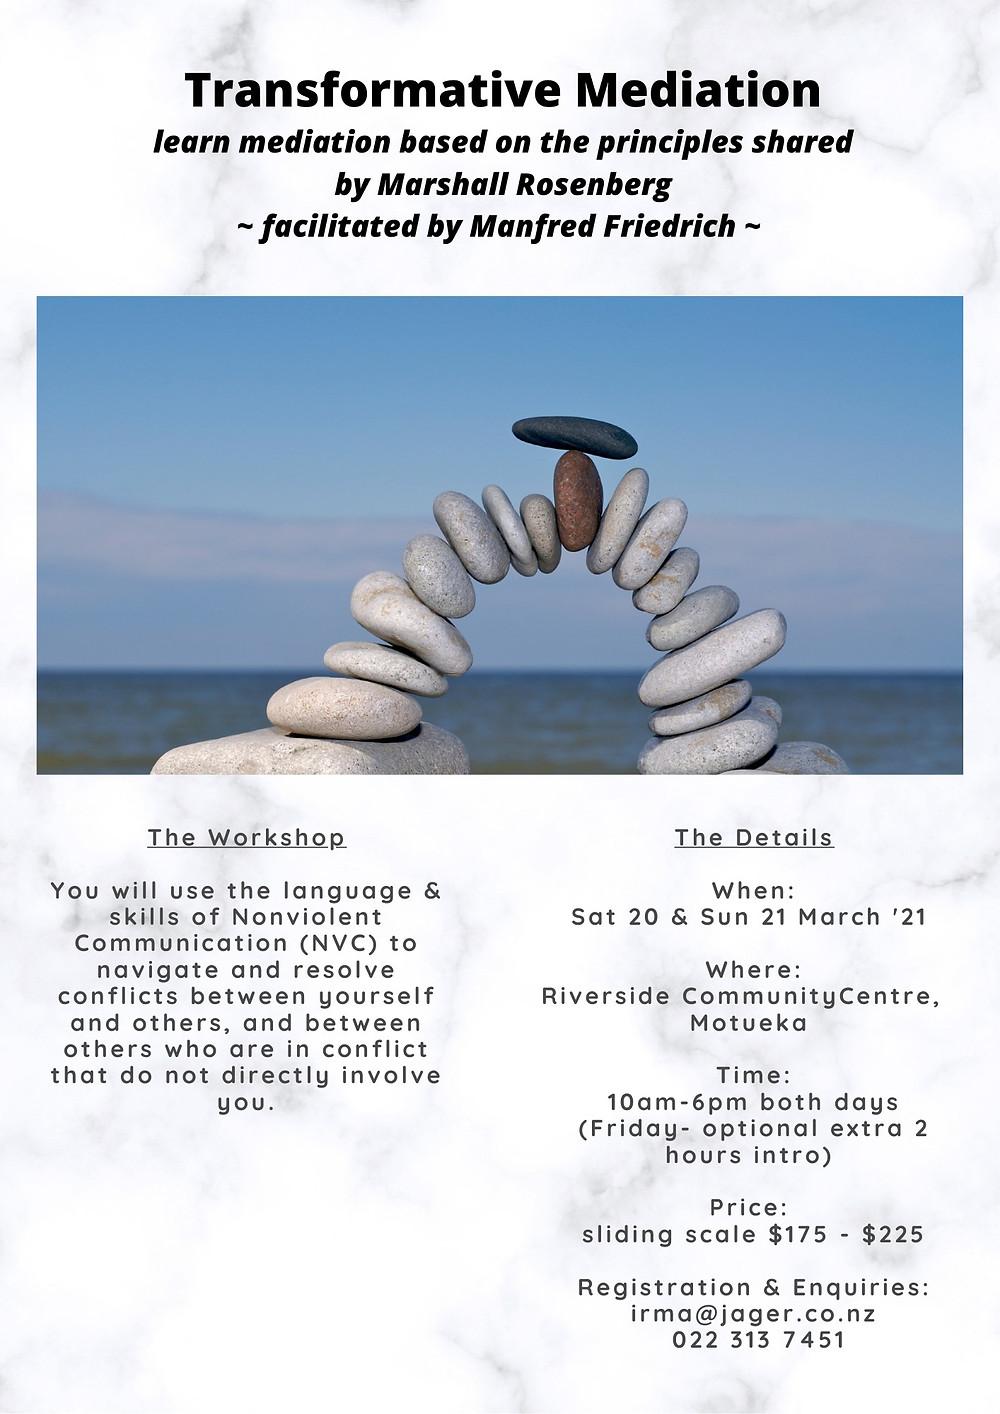 Transformative Mediation Workshop at Riverside Community NZ